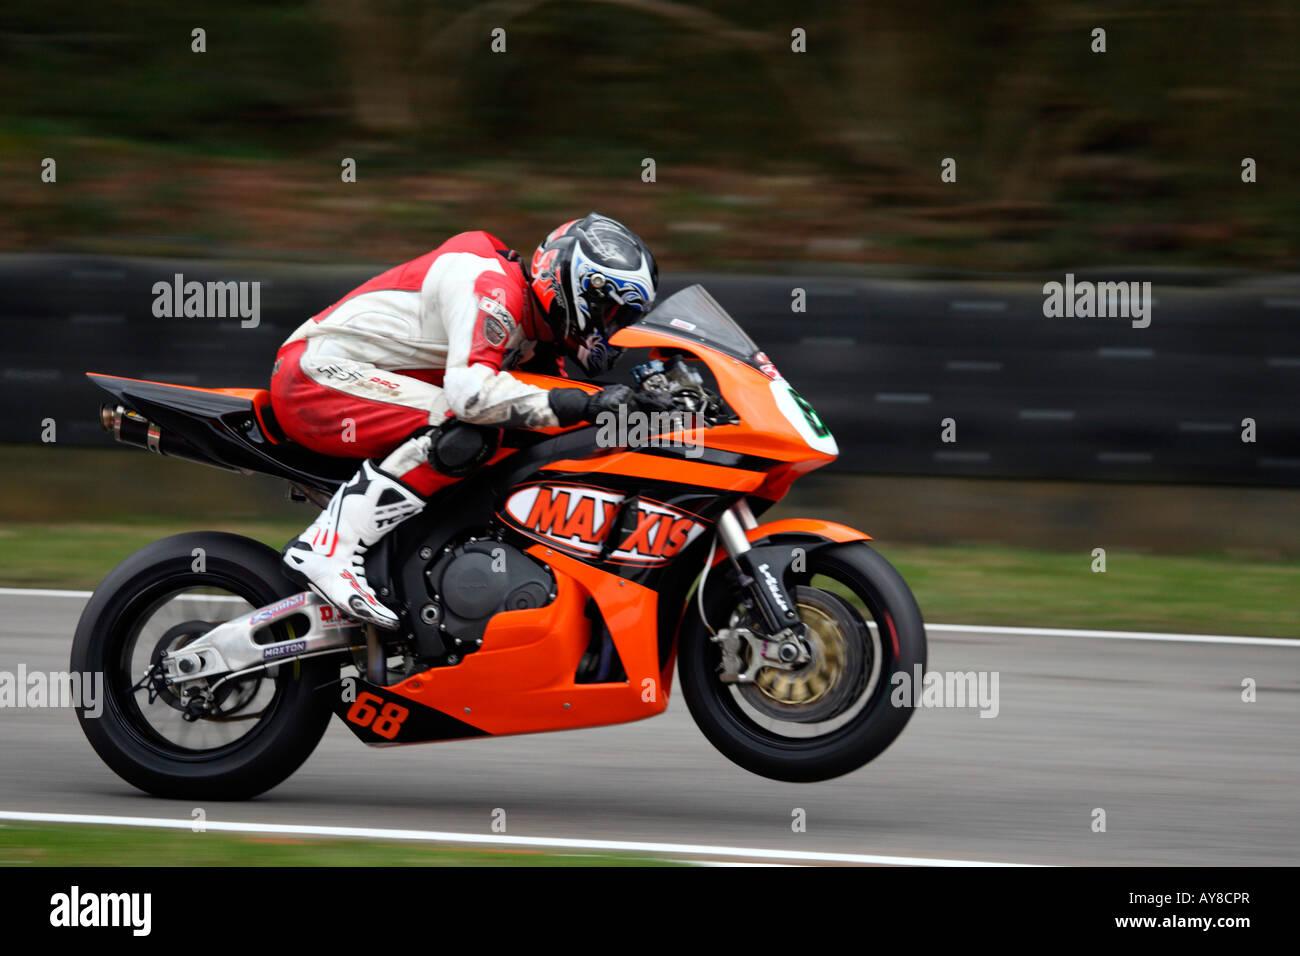 David Johnson British Superbike 2008 Team Maxxis Pulling Wheelie honda CBR1000RR Fireblade - Stock Image